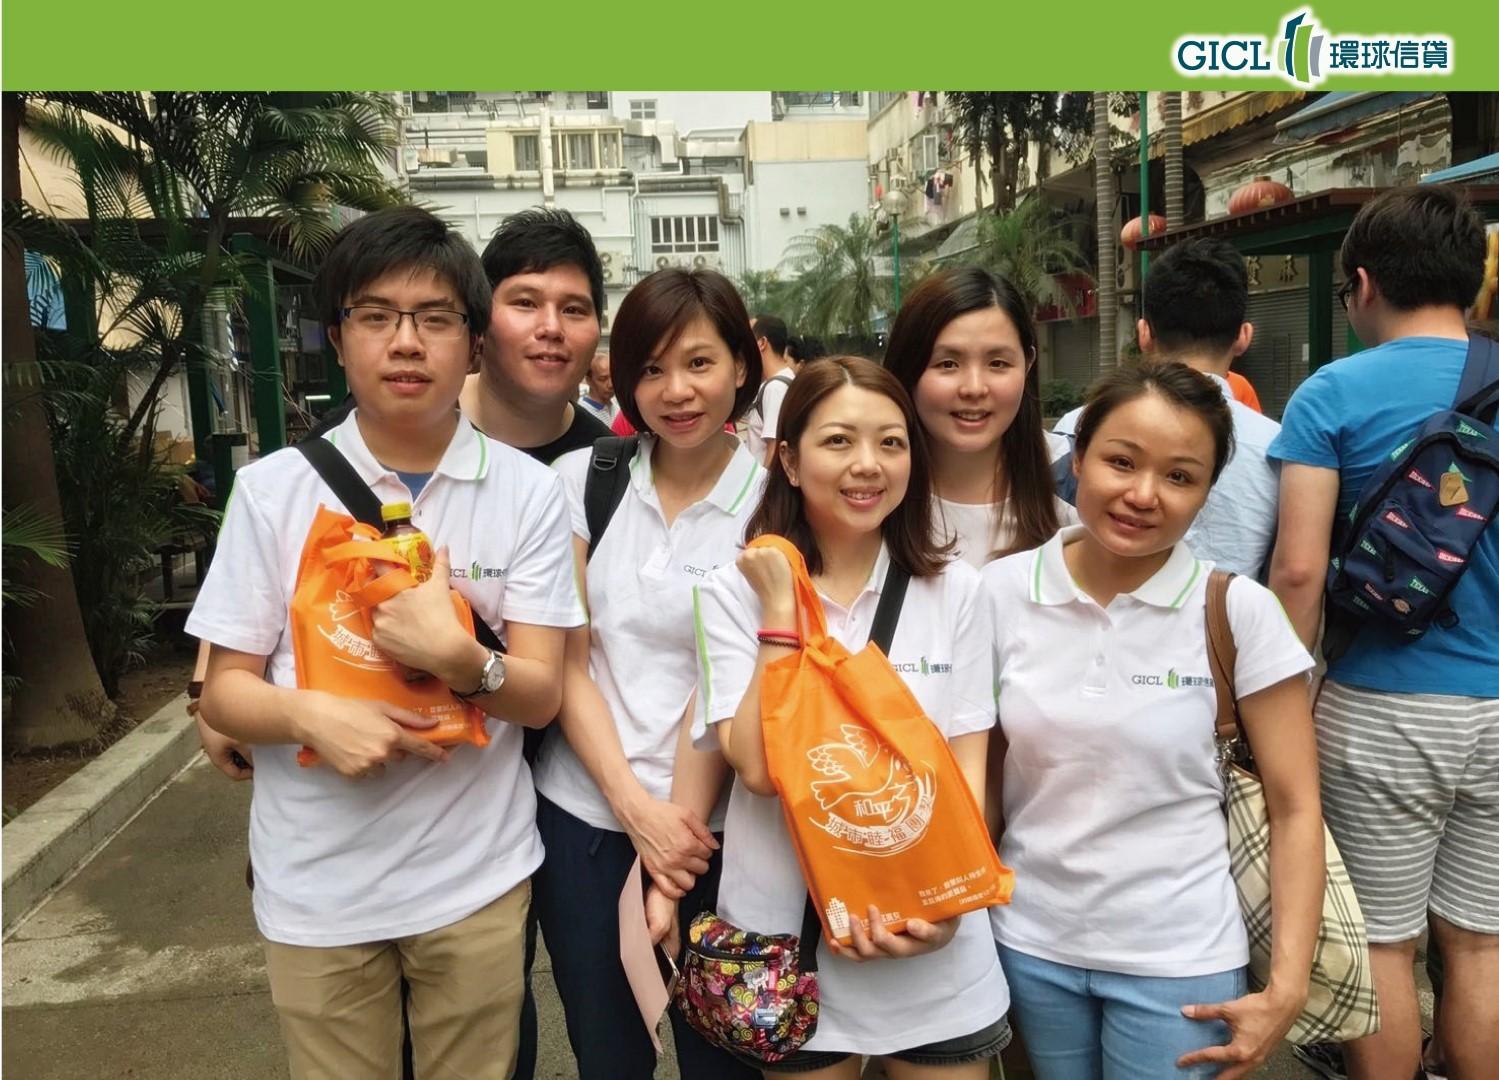 GICL X UPEF – HOME VISIT ACTIVITY IN TSUEN WAN 2017